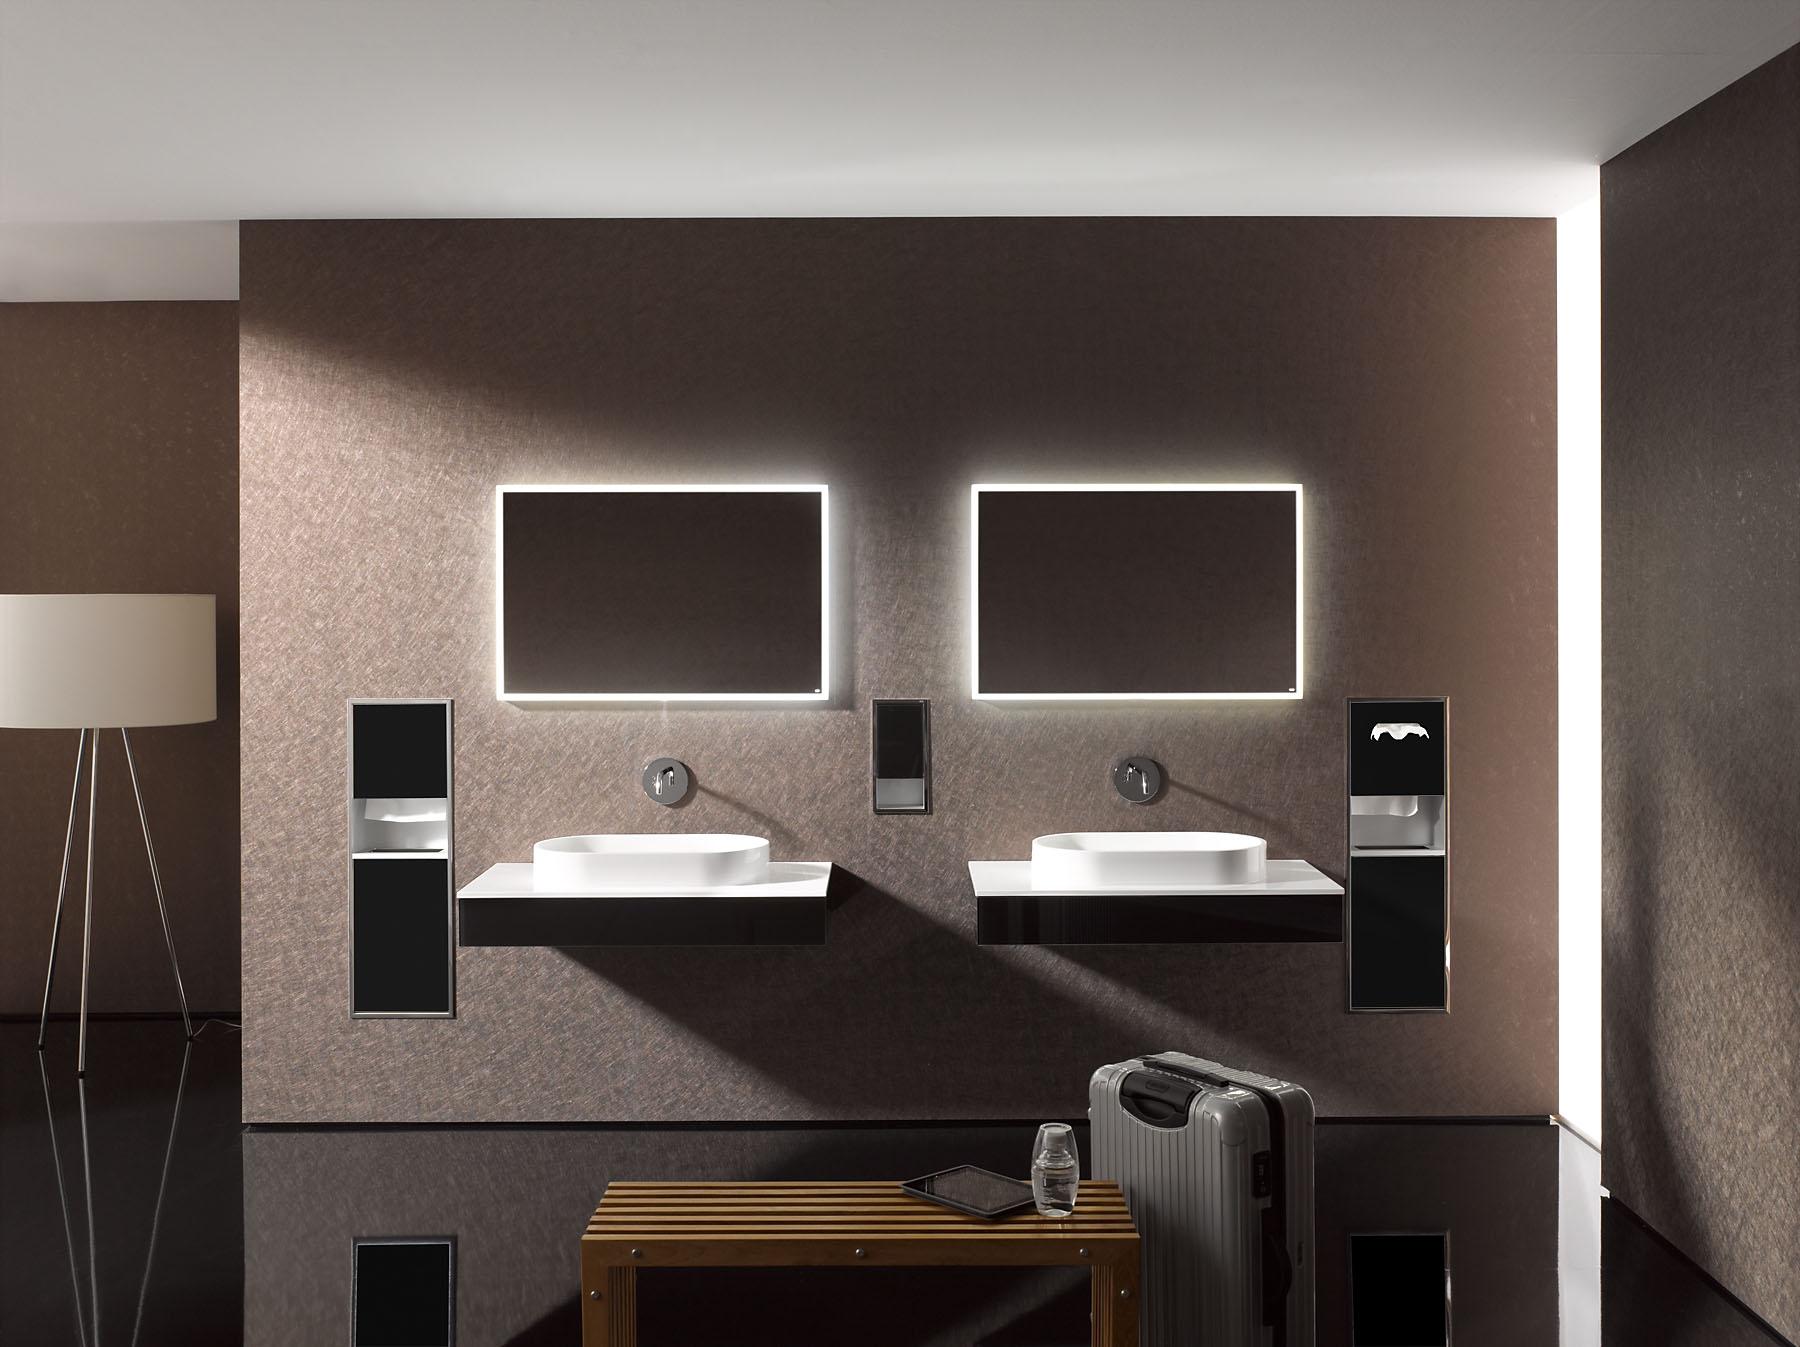 Emco luxe lichtspiegelkast met led verlichte kaderrand for Led verlichting spiegelkast badkamer